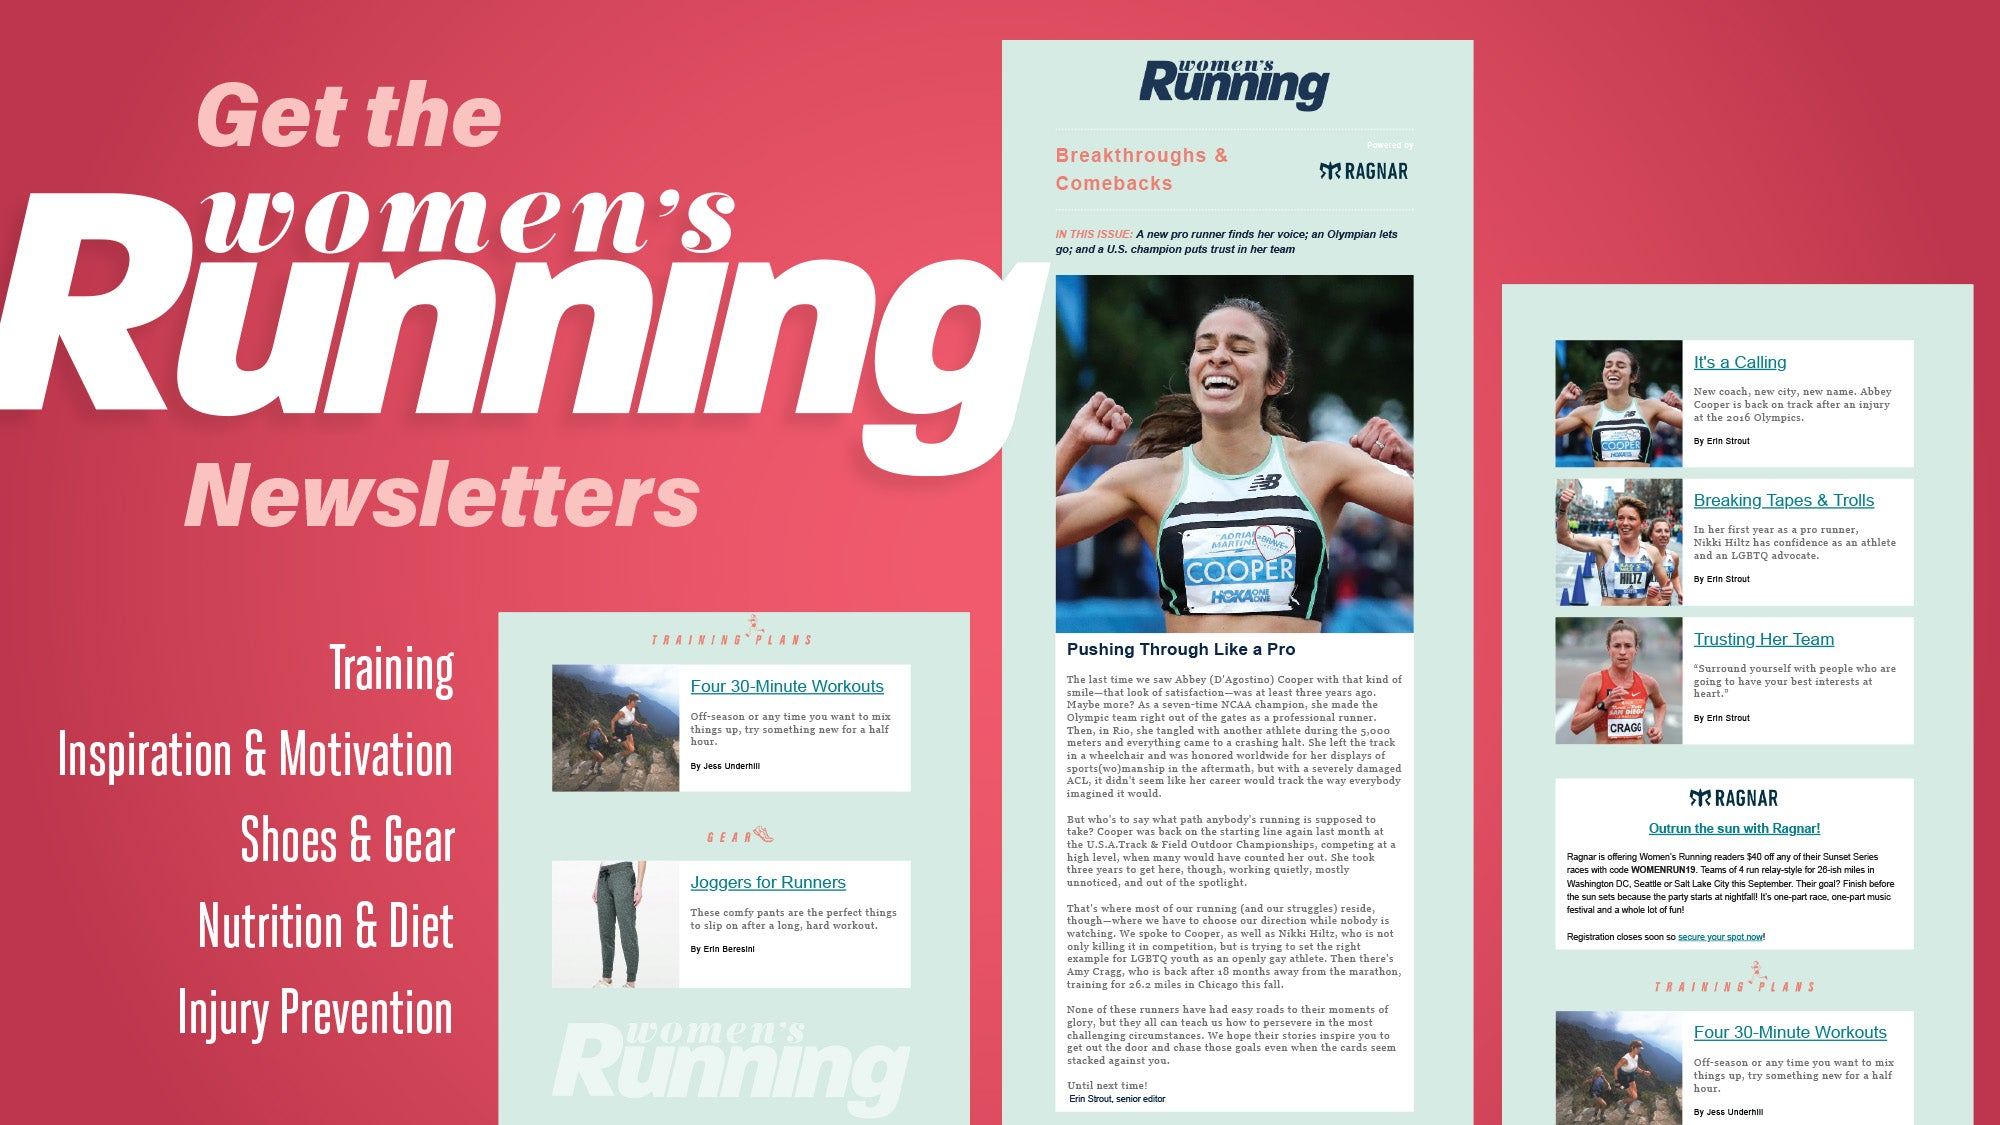 Women's Running email newsletter landing page 2000x1125